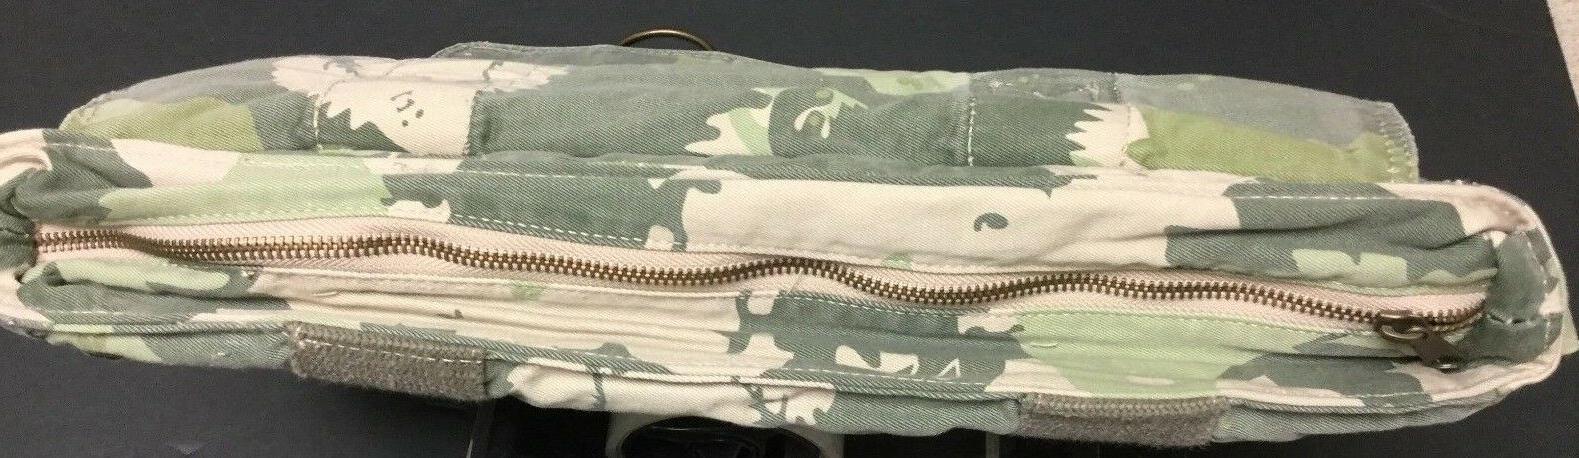 IPath Bigfoot Laptop Bag Case